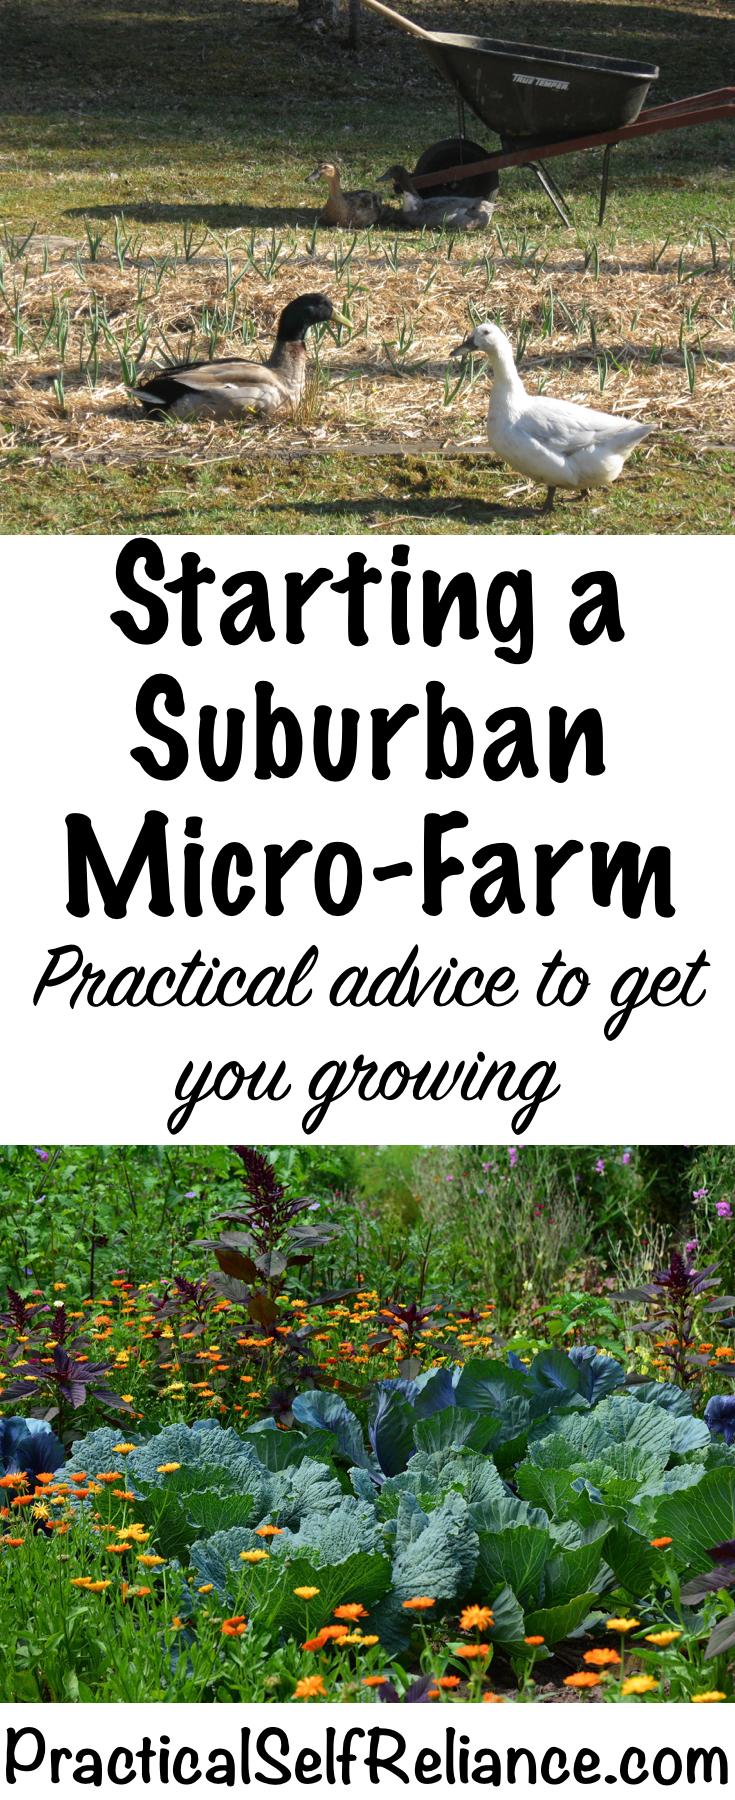 Practical Advice for Starting a Suburban Micro-Farm